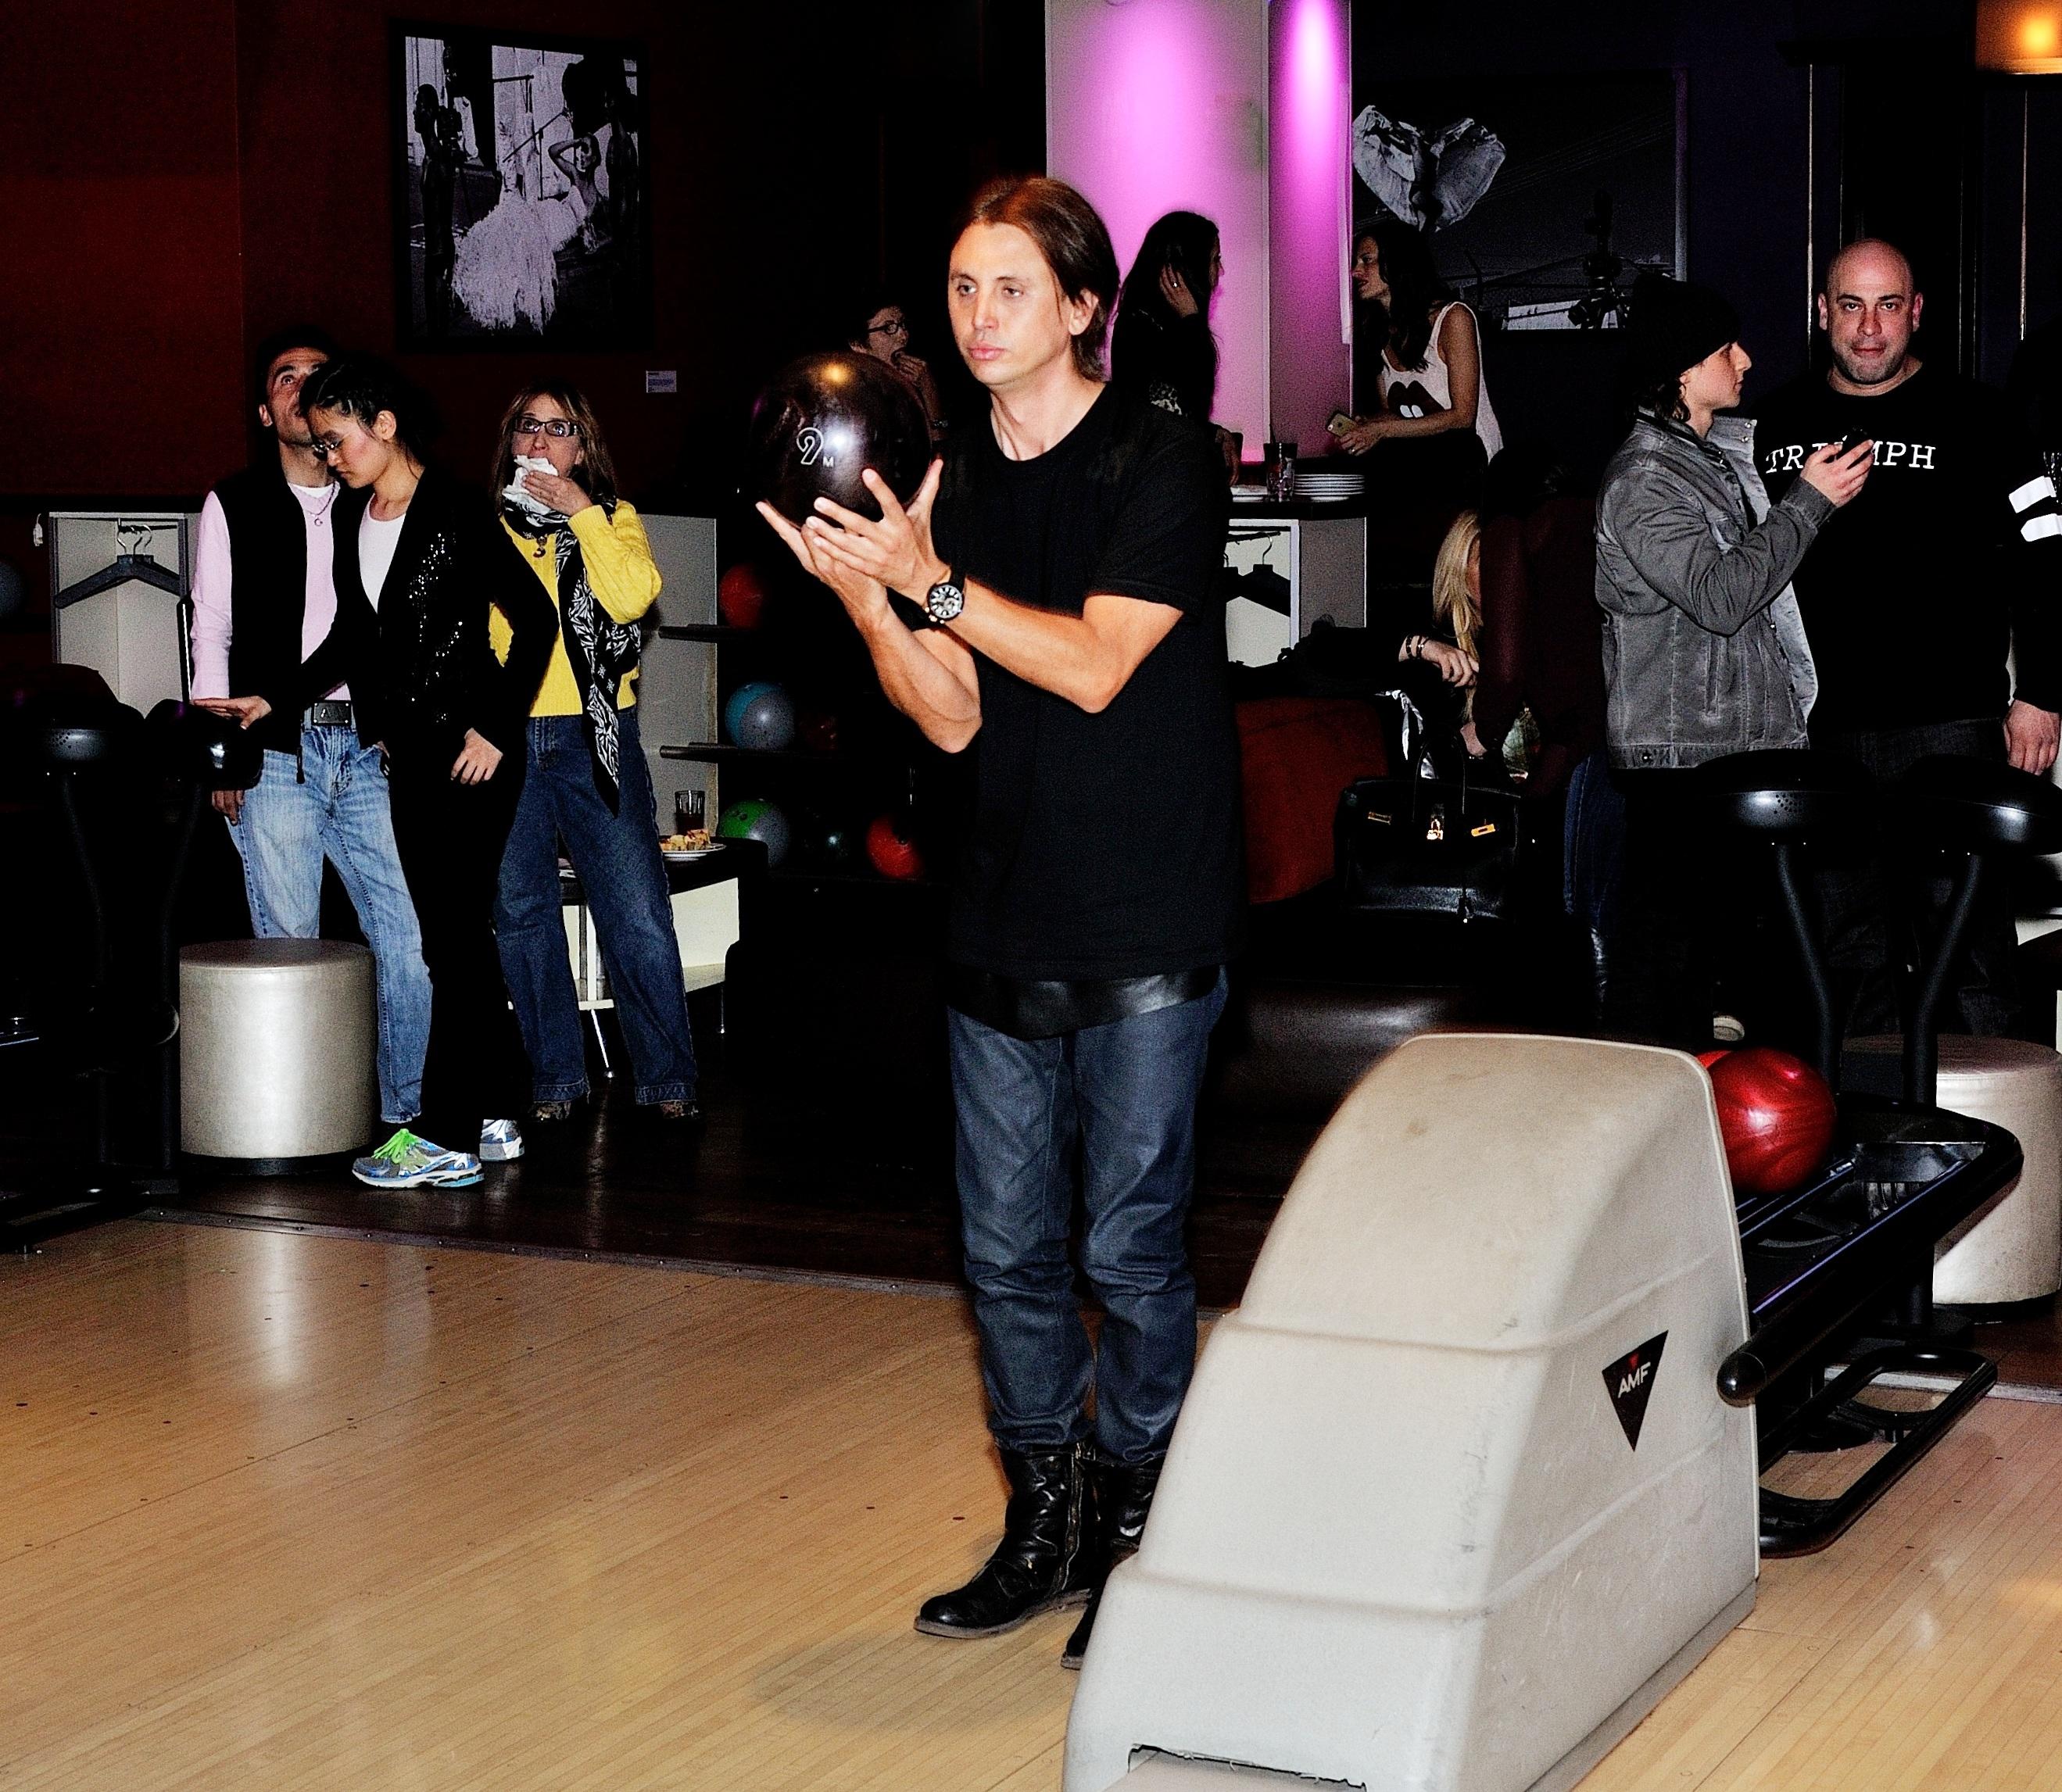 Jonathan Cheban Hosts Bowling Benefit at Frames Bowling Lounge in NYC